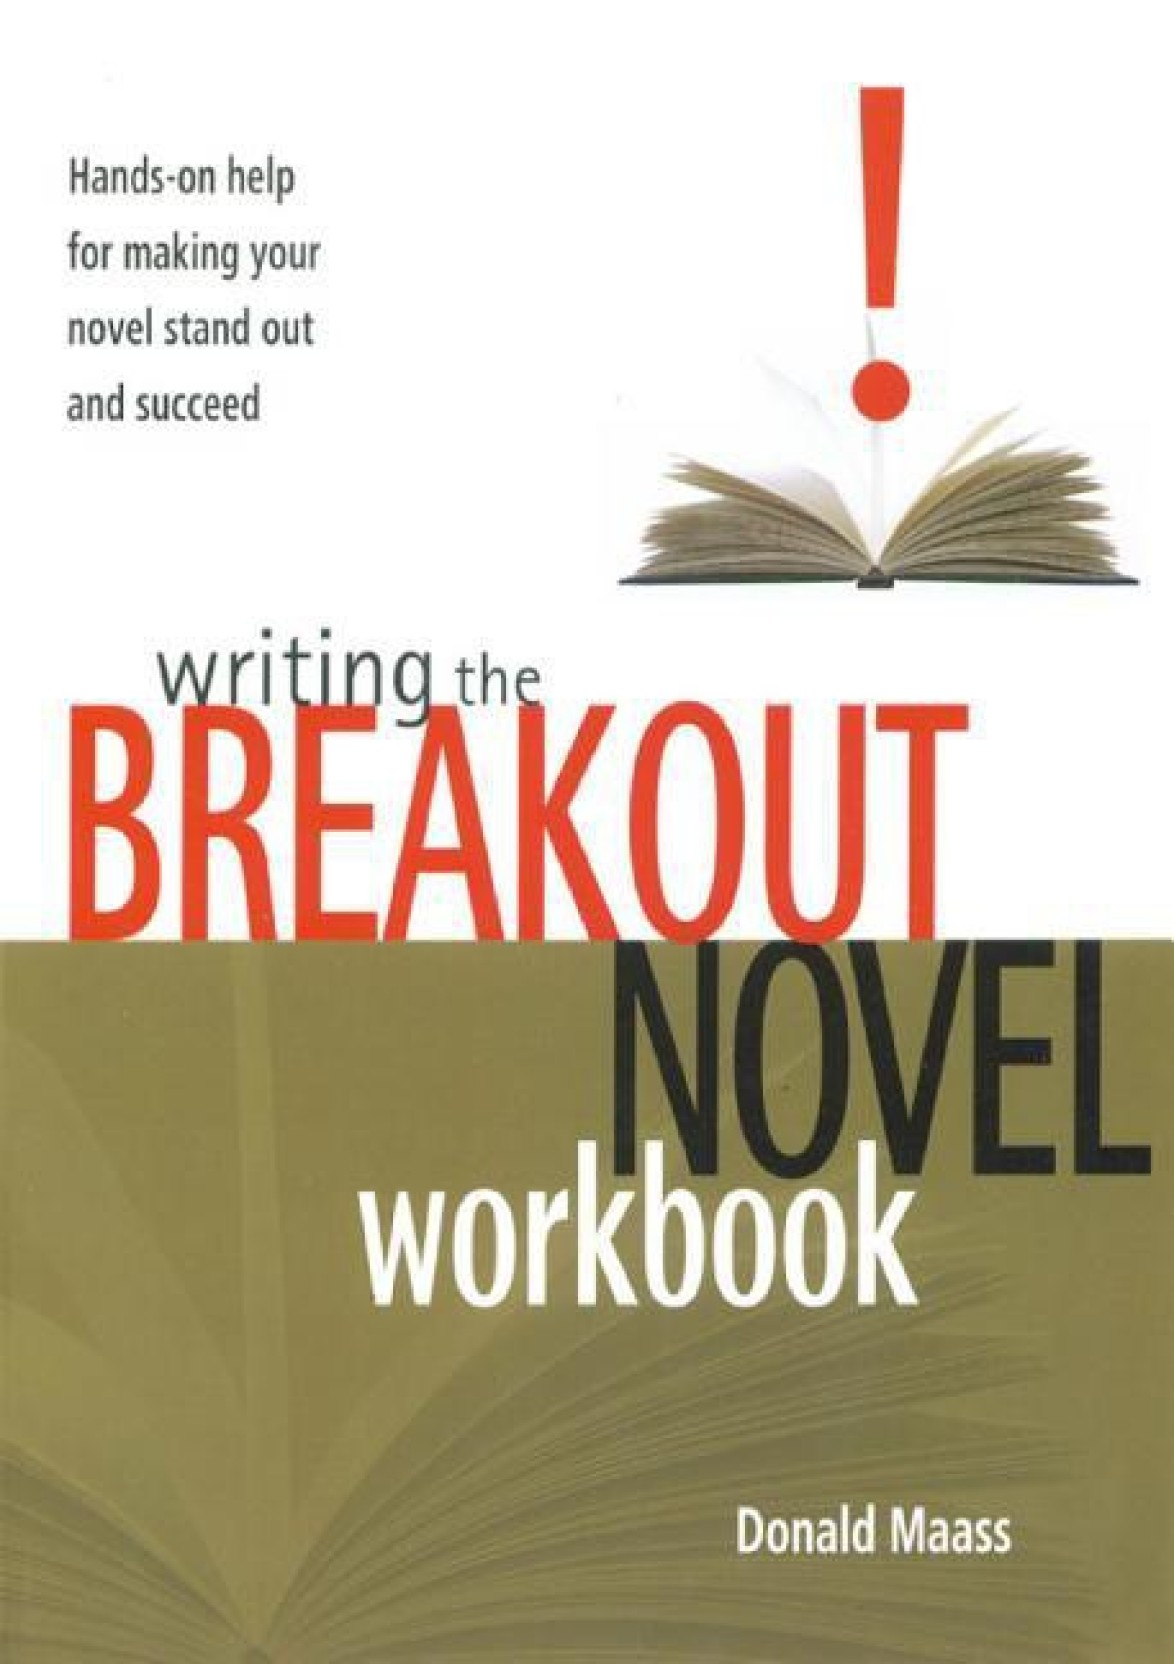 Writing the Breakout Novel Workbook. Share